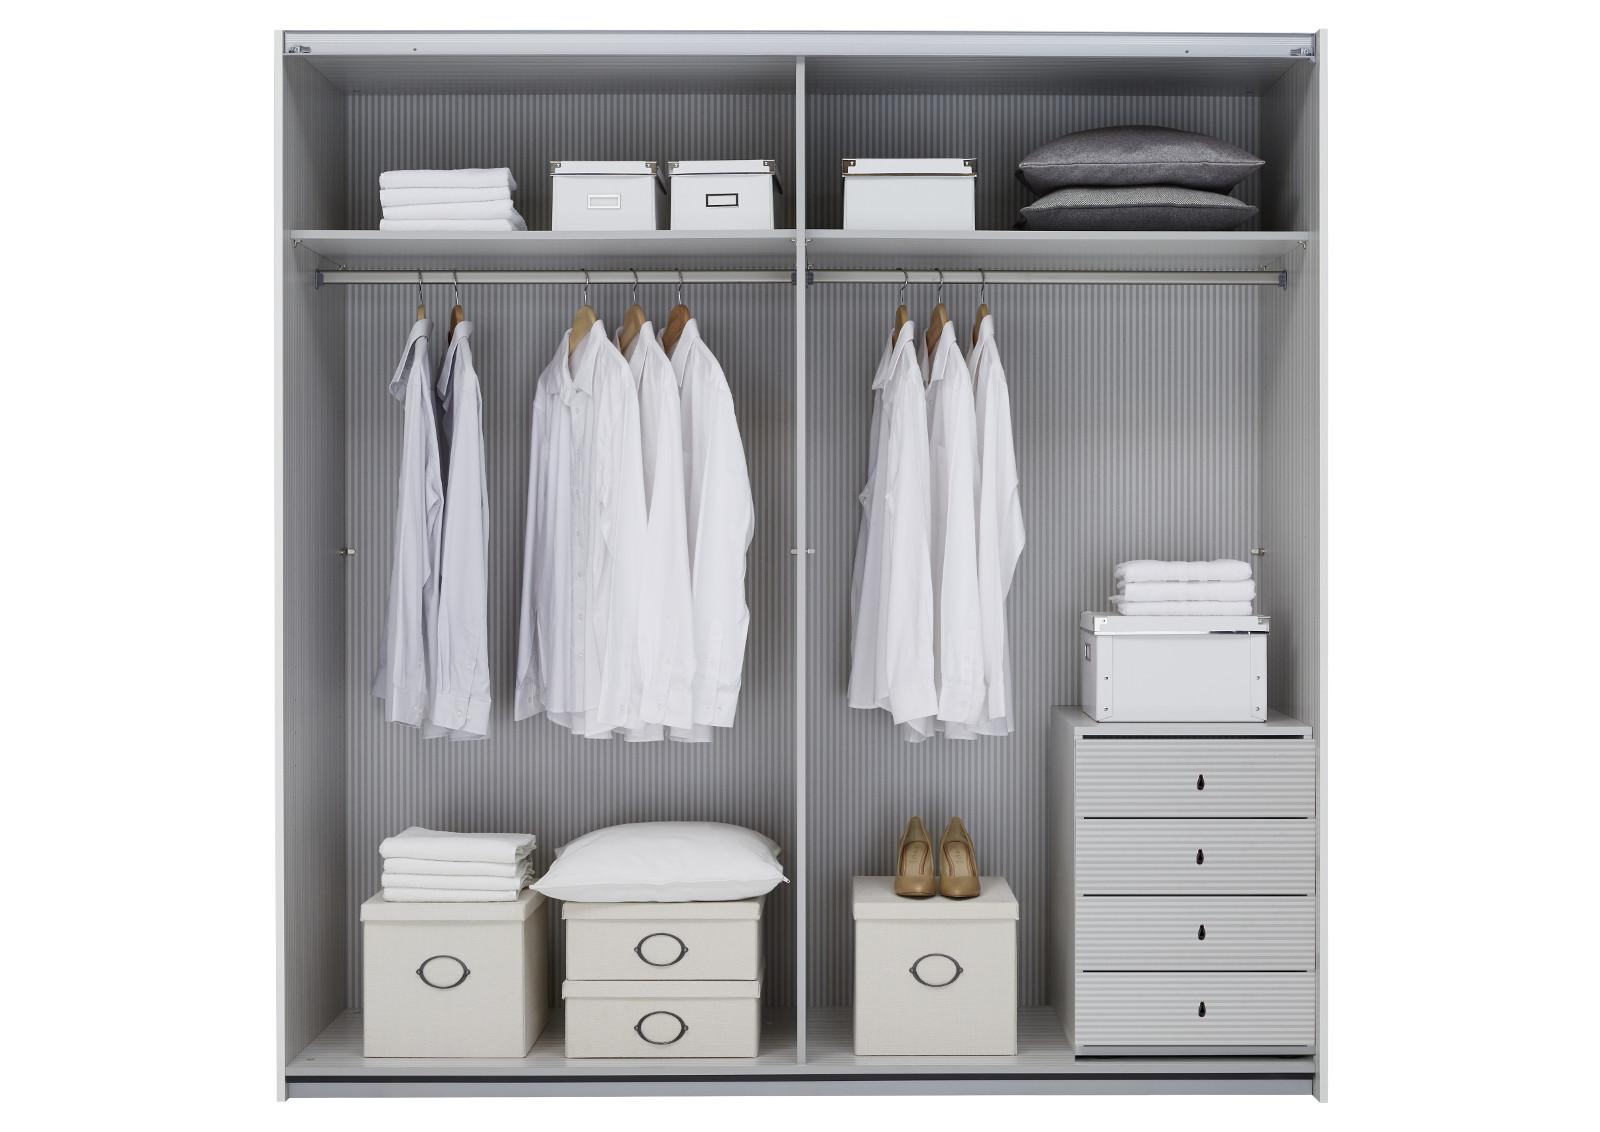 schwebet renschrank wei spiegel quadratisch. Black Bedroom Furniture Sets. Home Design Ideas